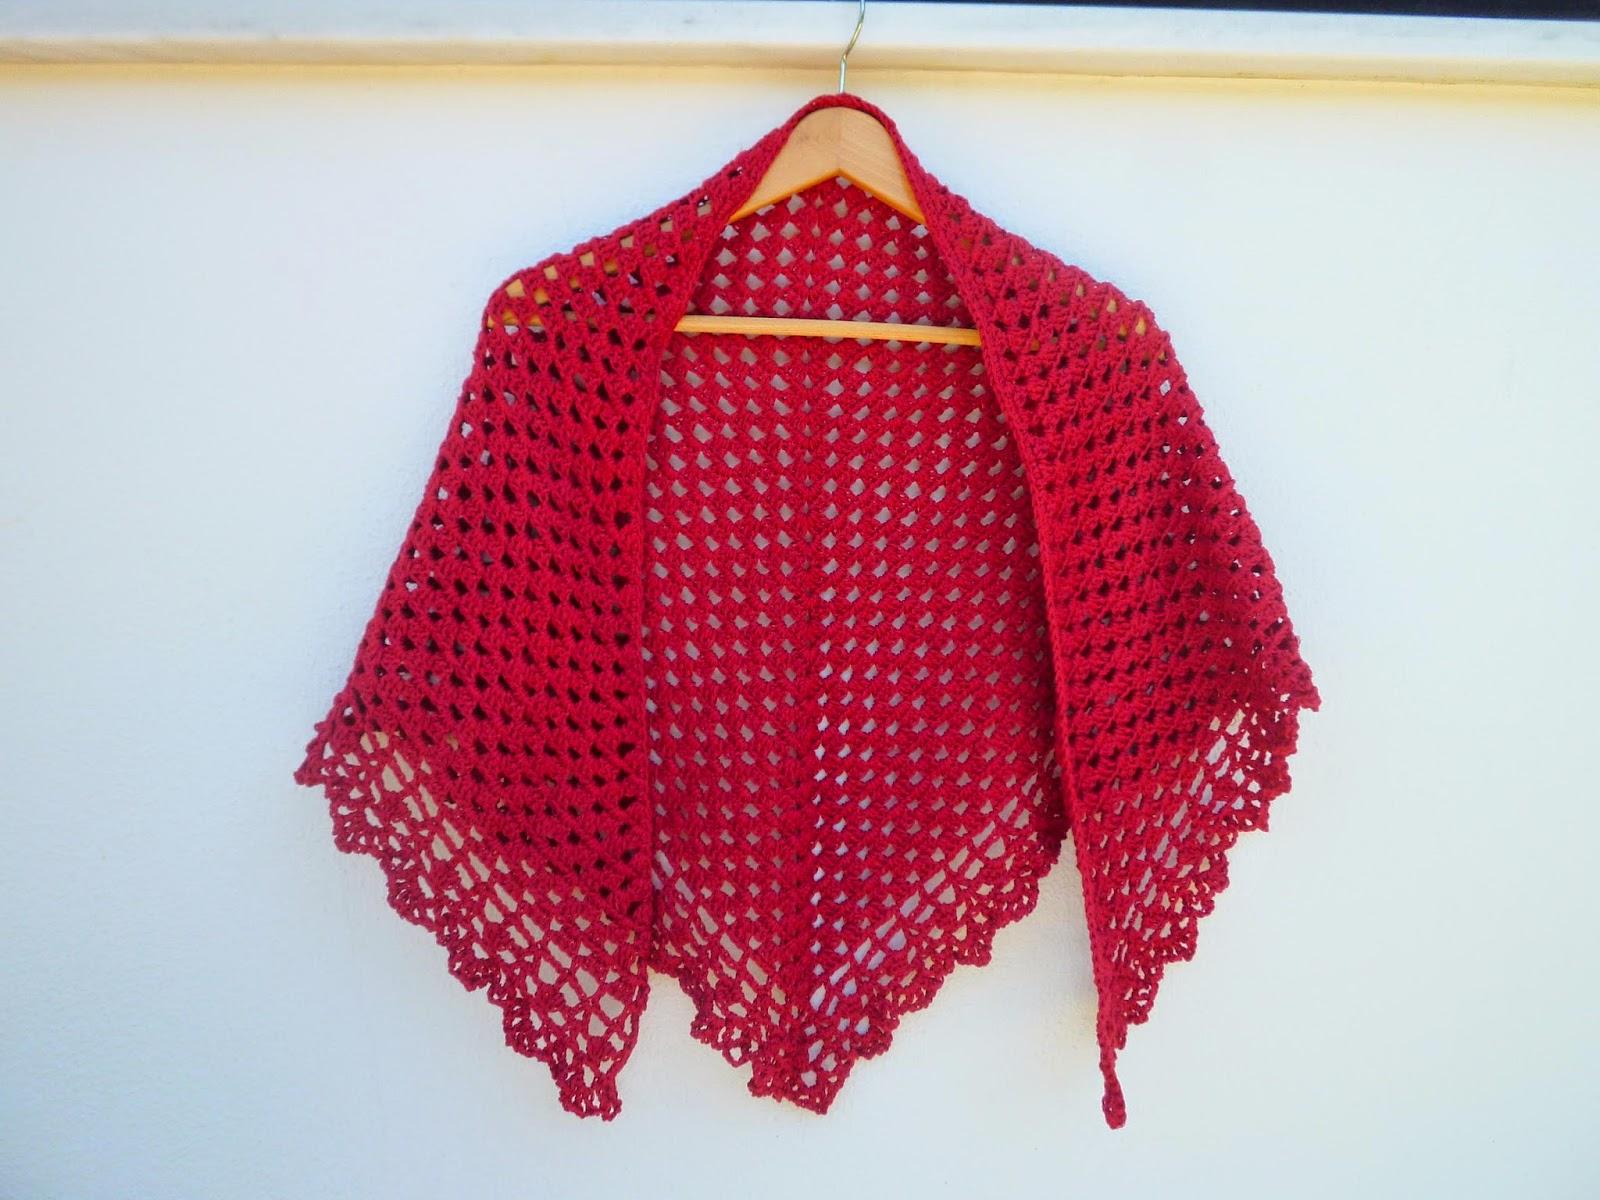 el ganchillo engancha...: chal, pico o toquilla a crochet